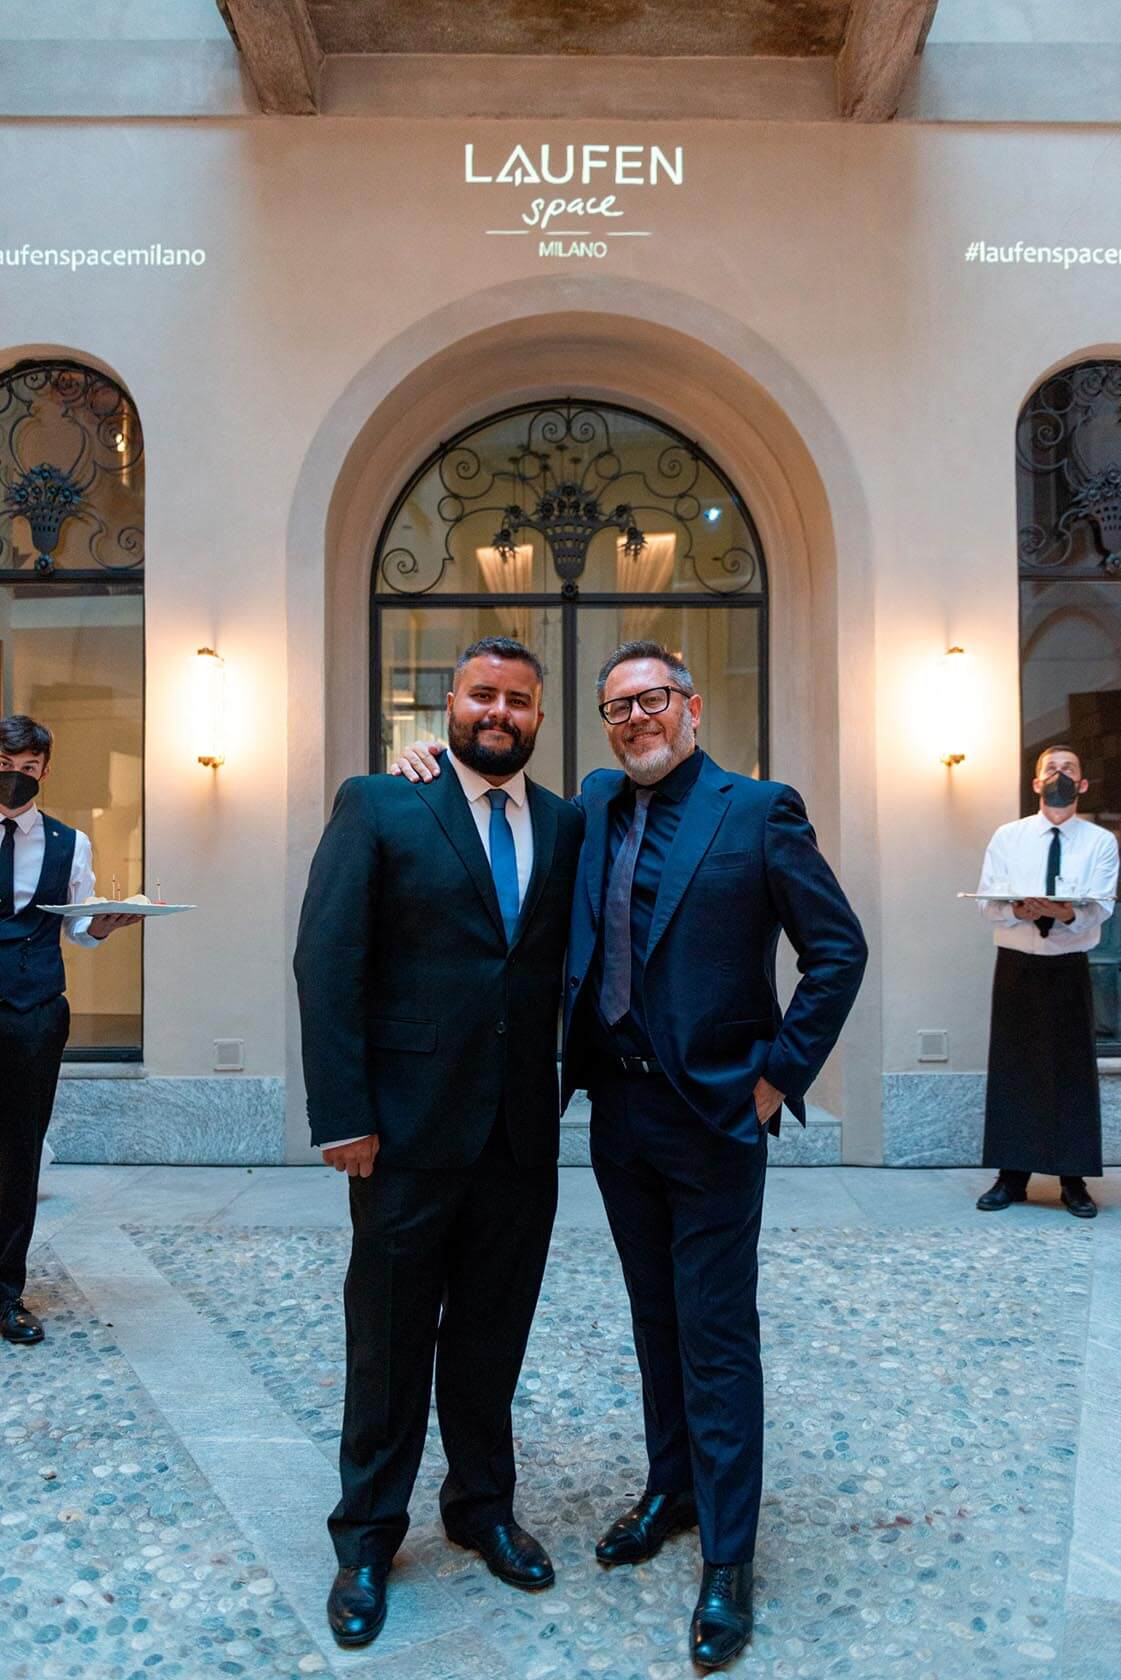 Luis Antunes and Gerardo Sannella in front of Laufen Space Milano.